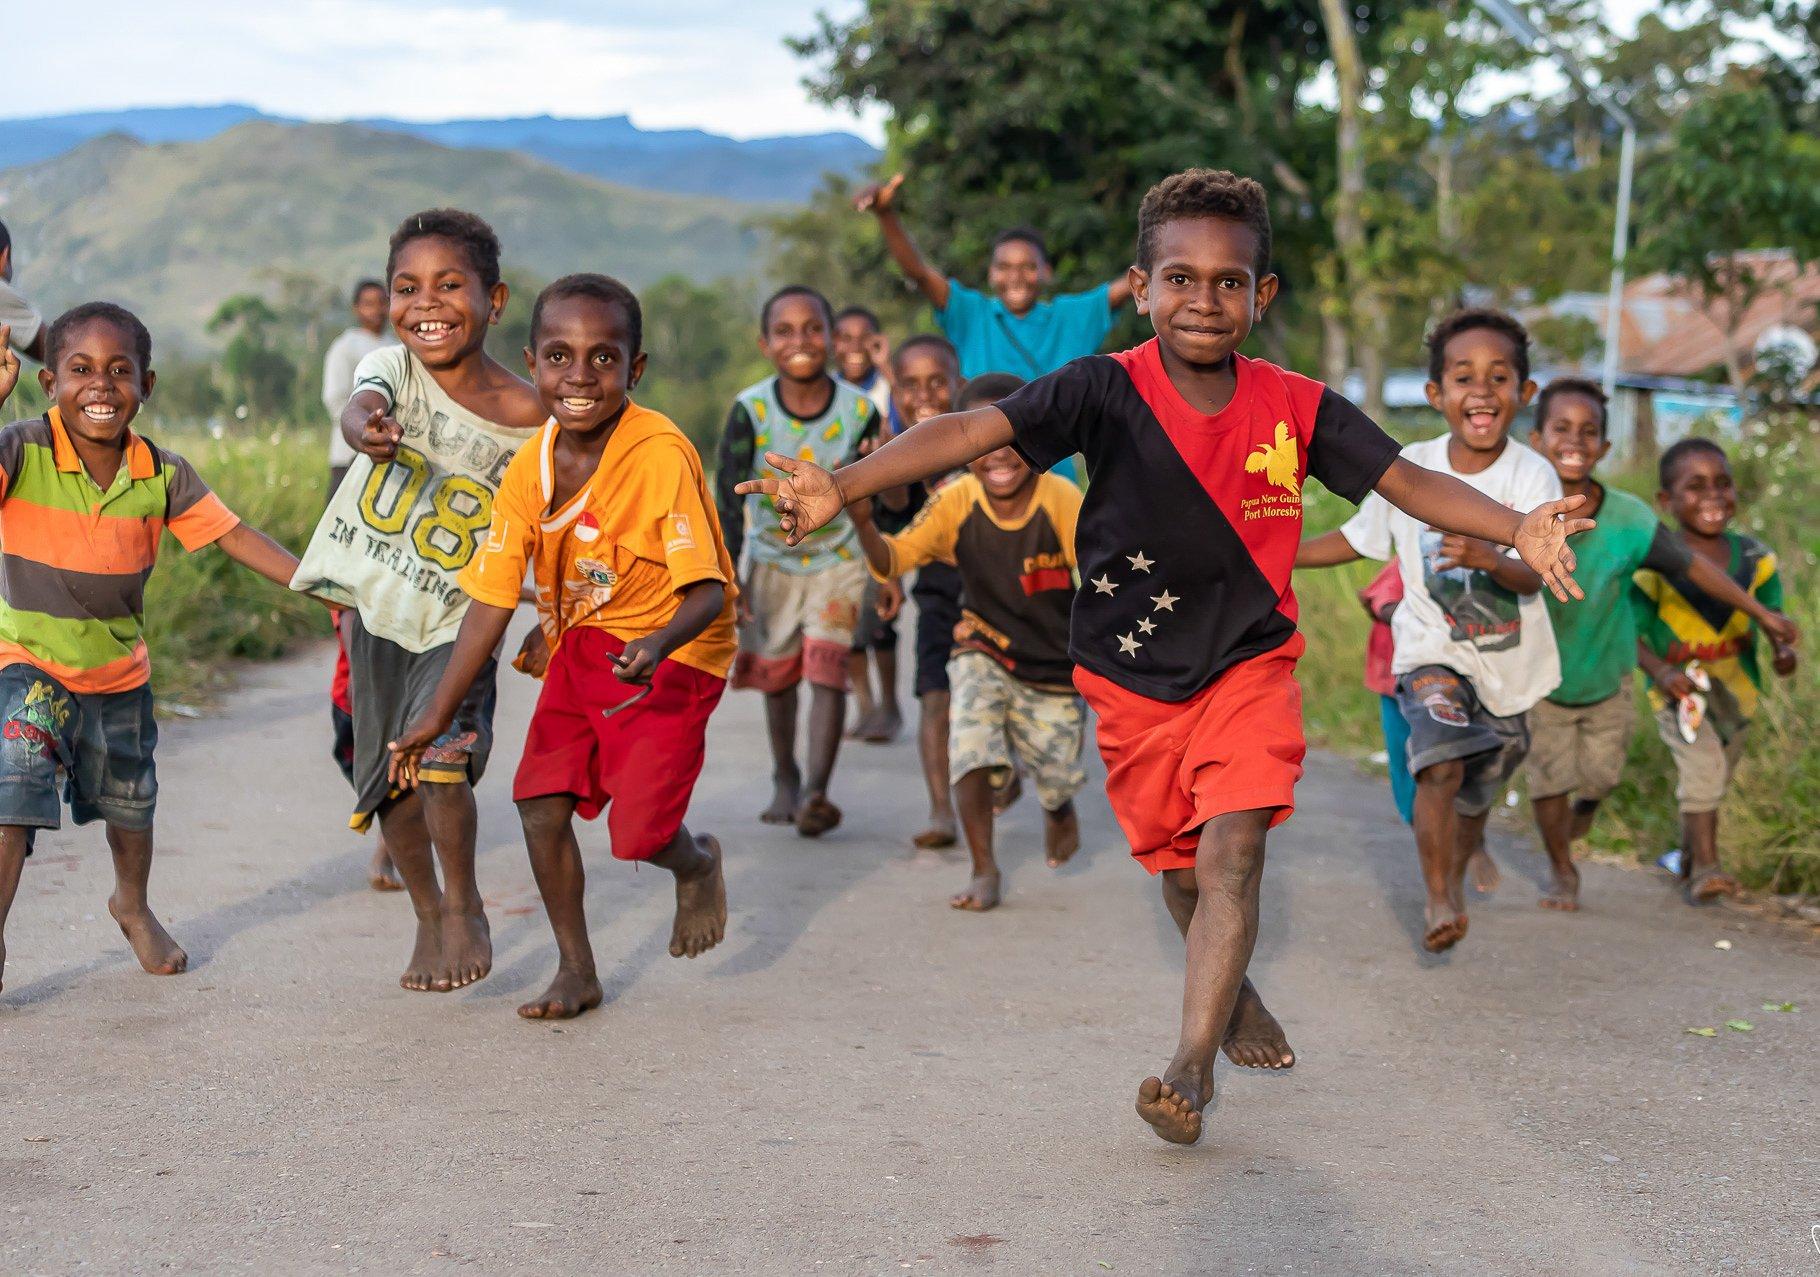 Wamena / Batı Papua / 2019